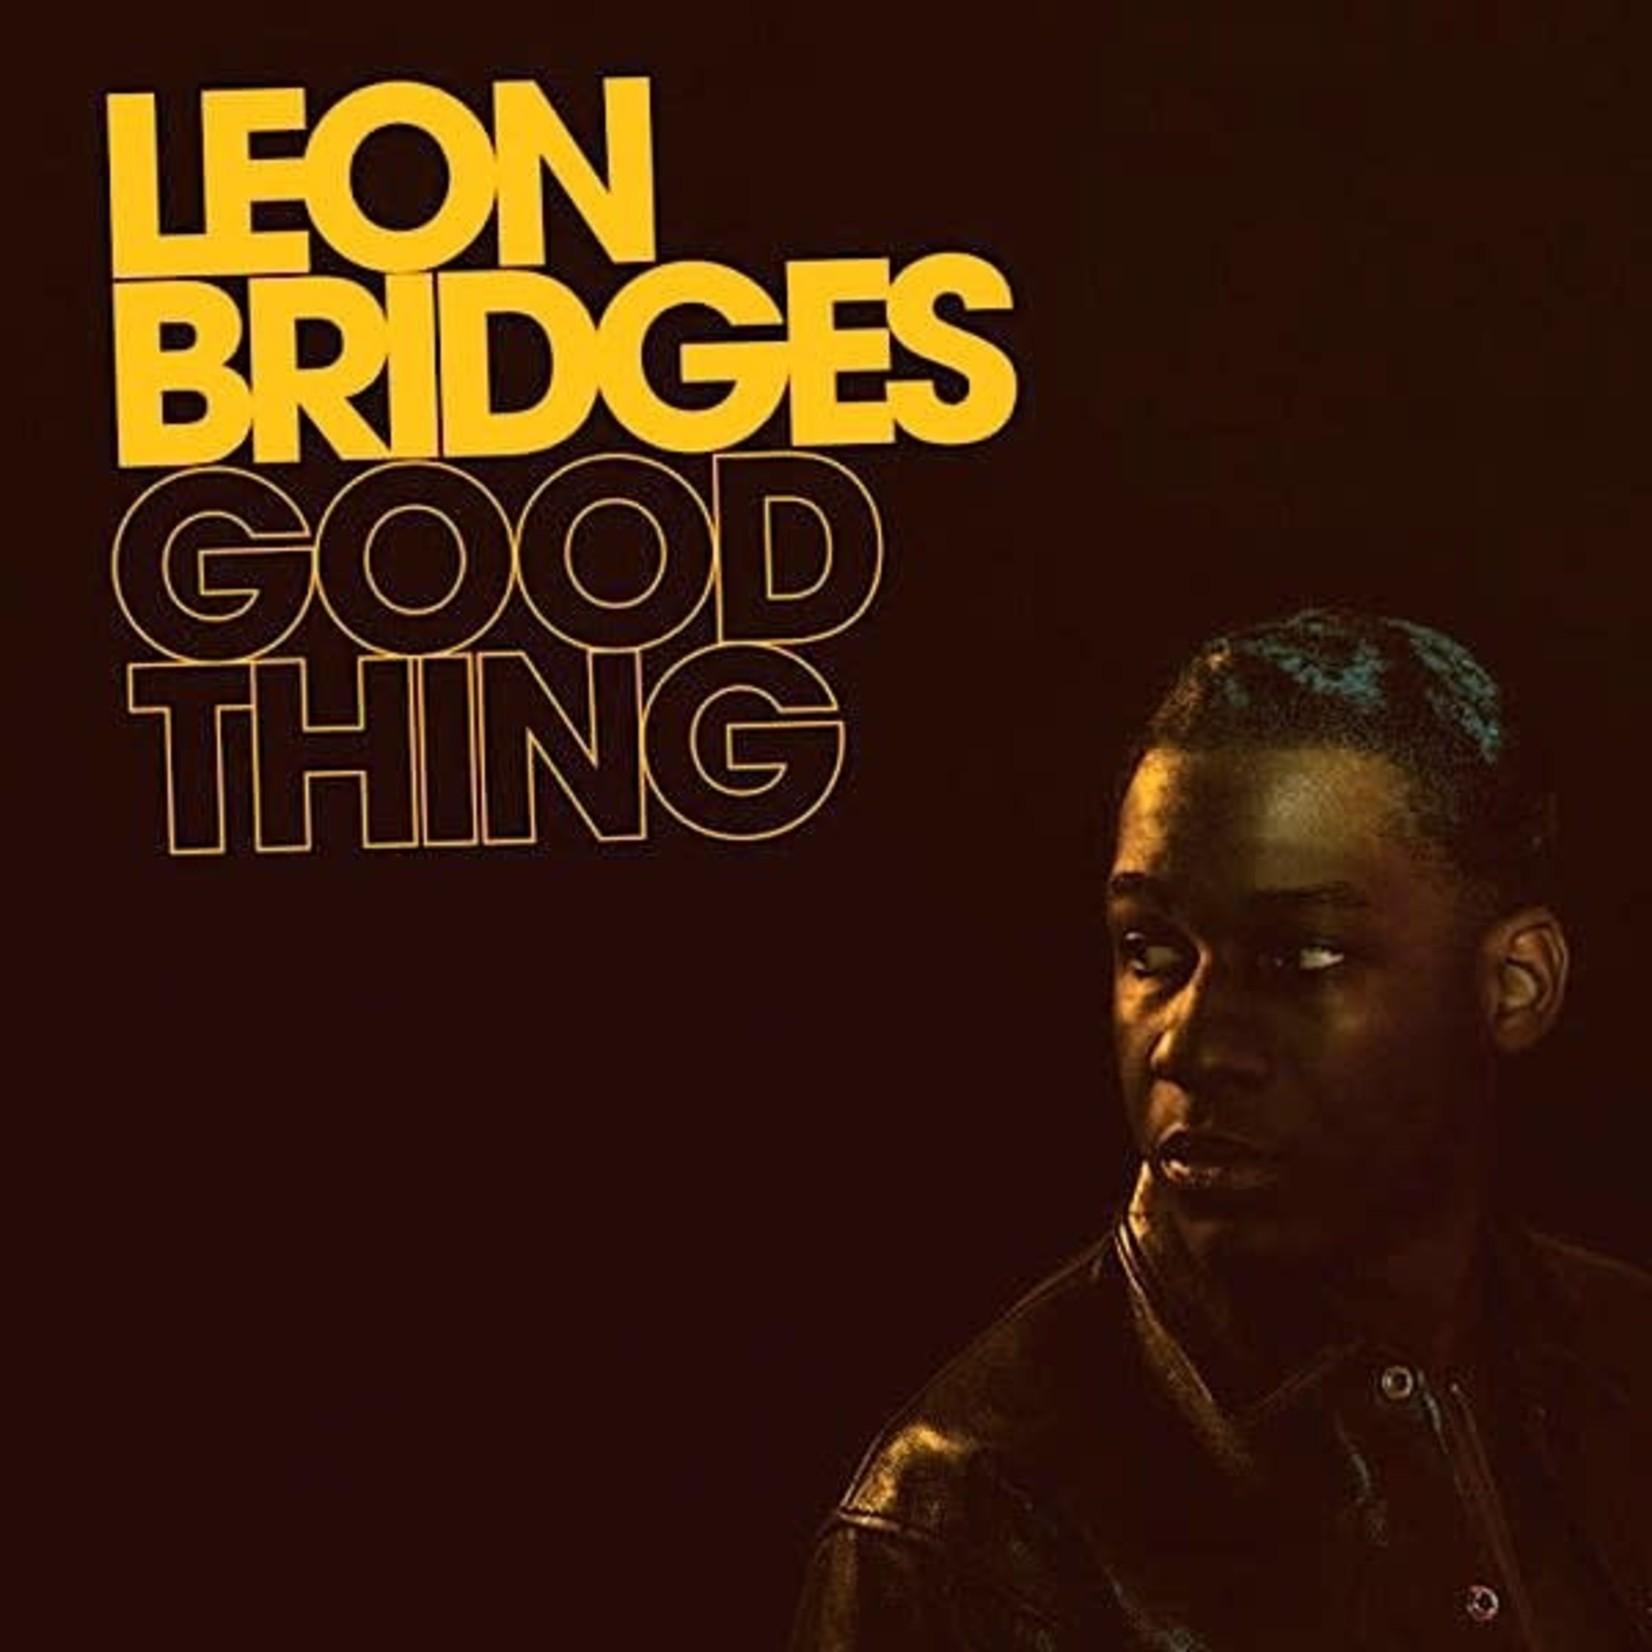 [New] Bridges, Leon: Good Thing (yellow vinyl)